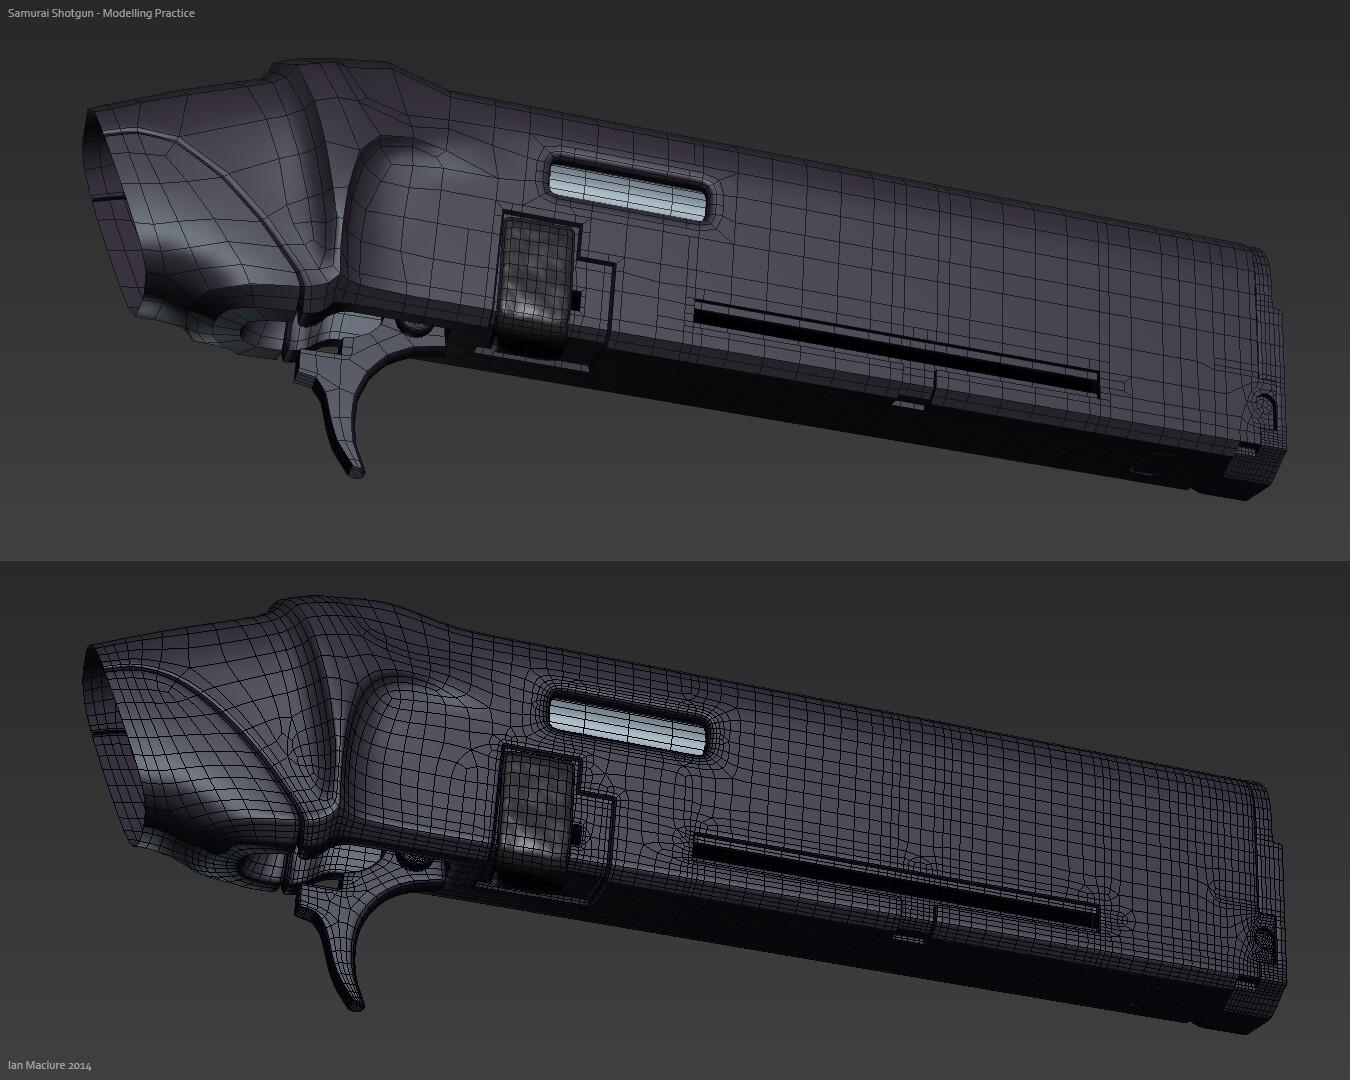 Ian maclure shotgun modelling 2